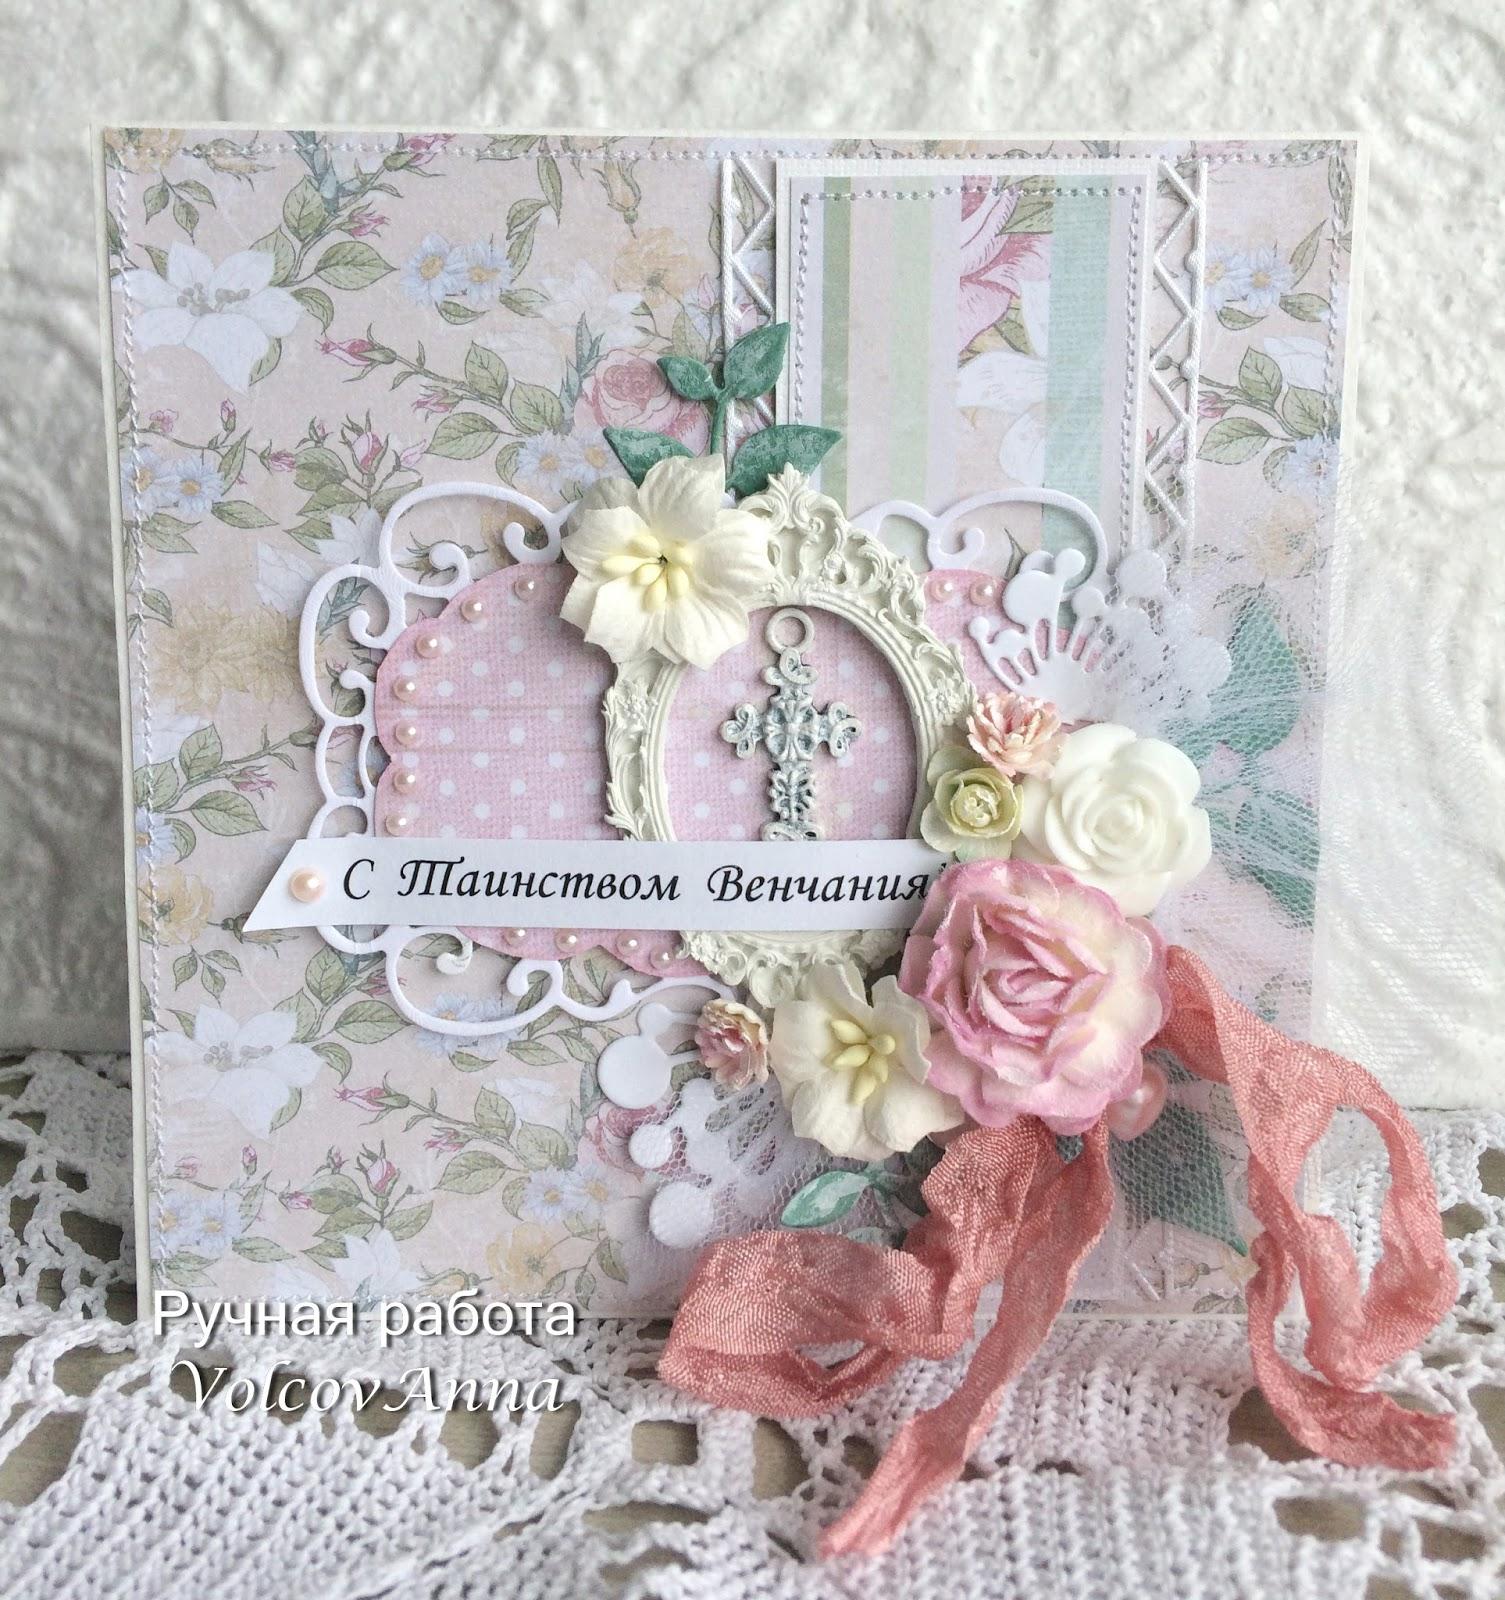 Венчание картинка открытка